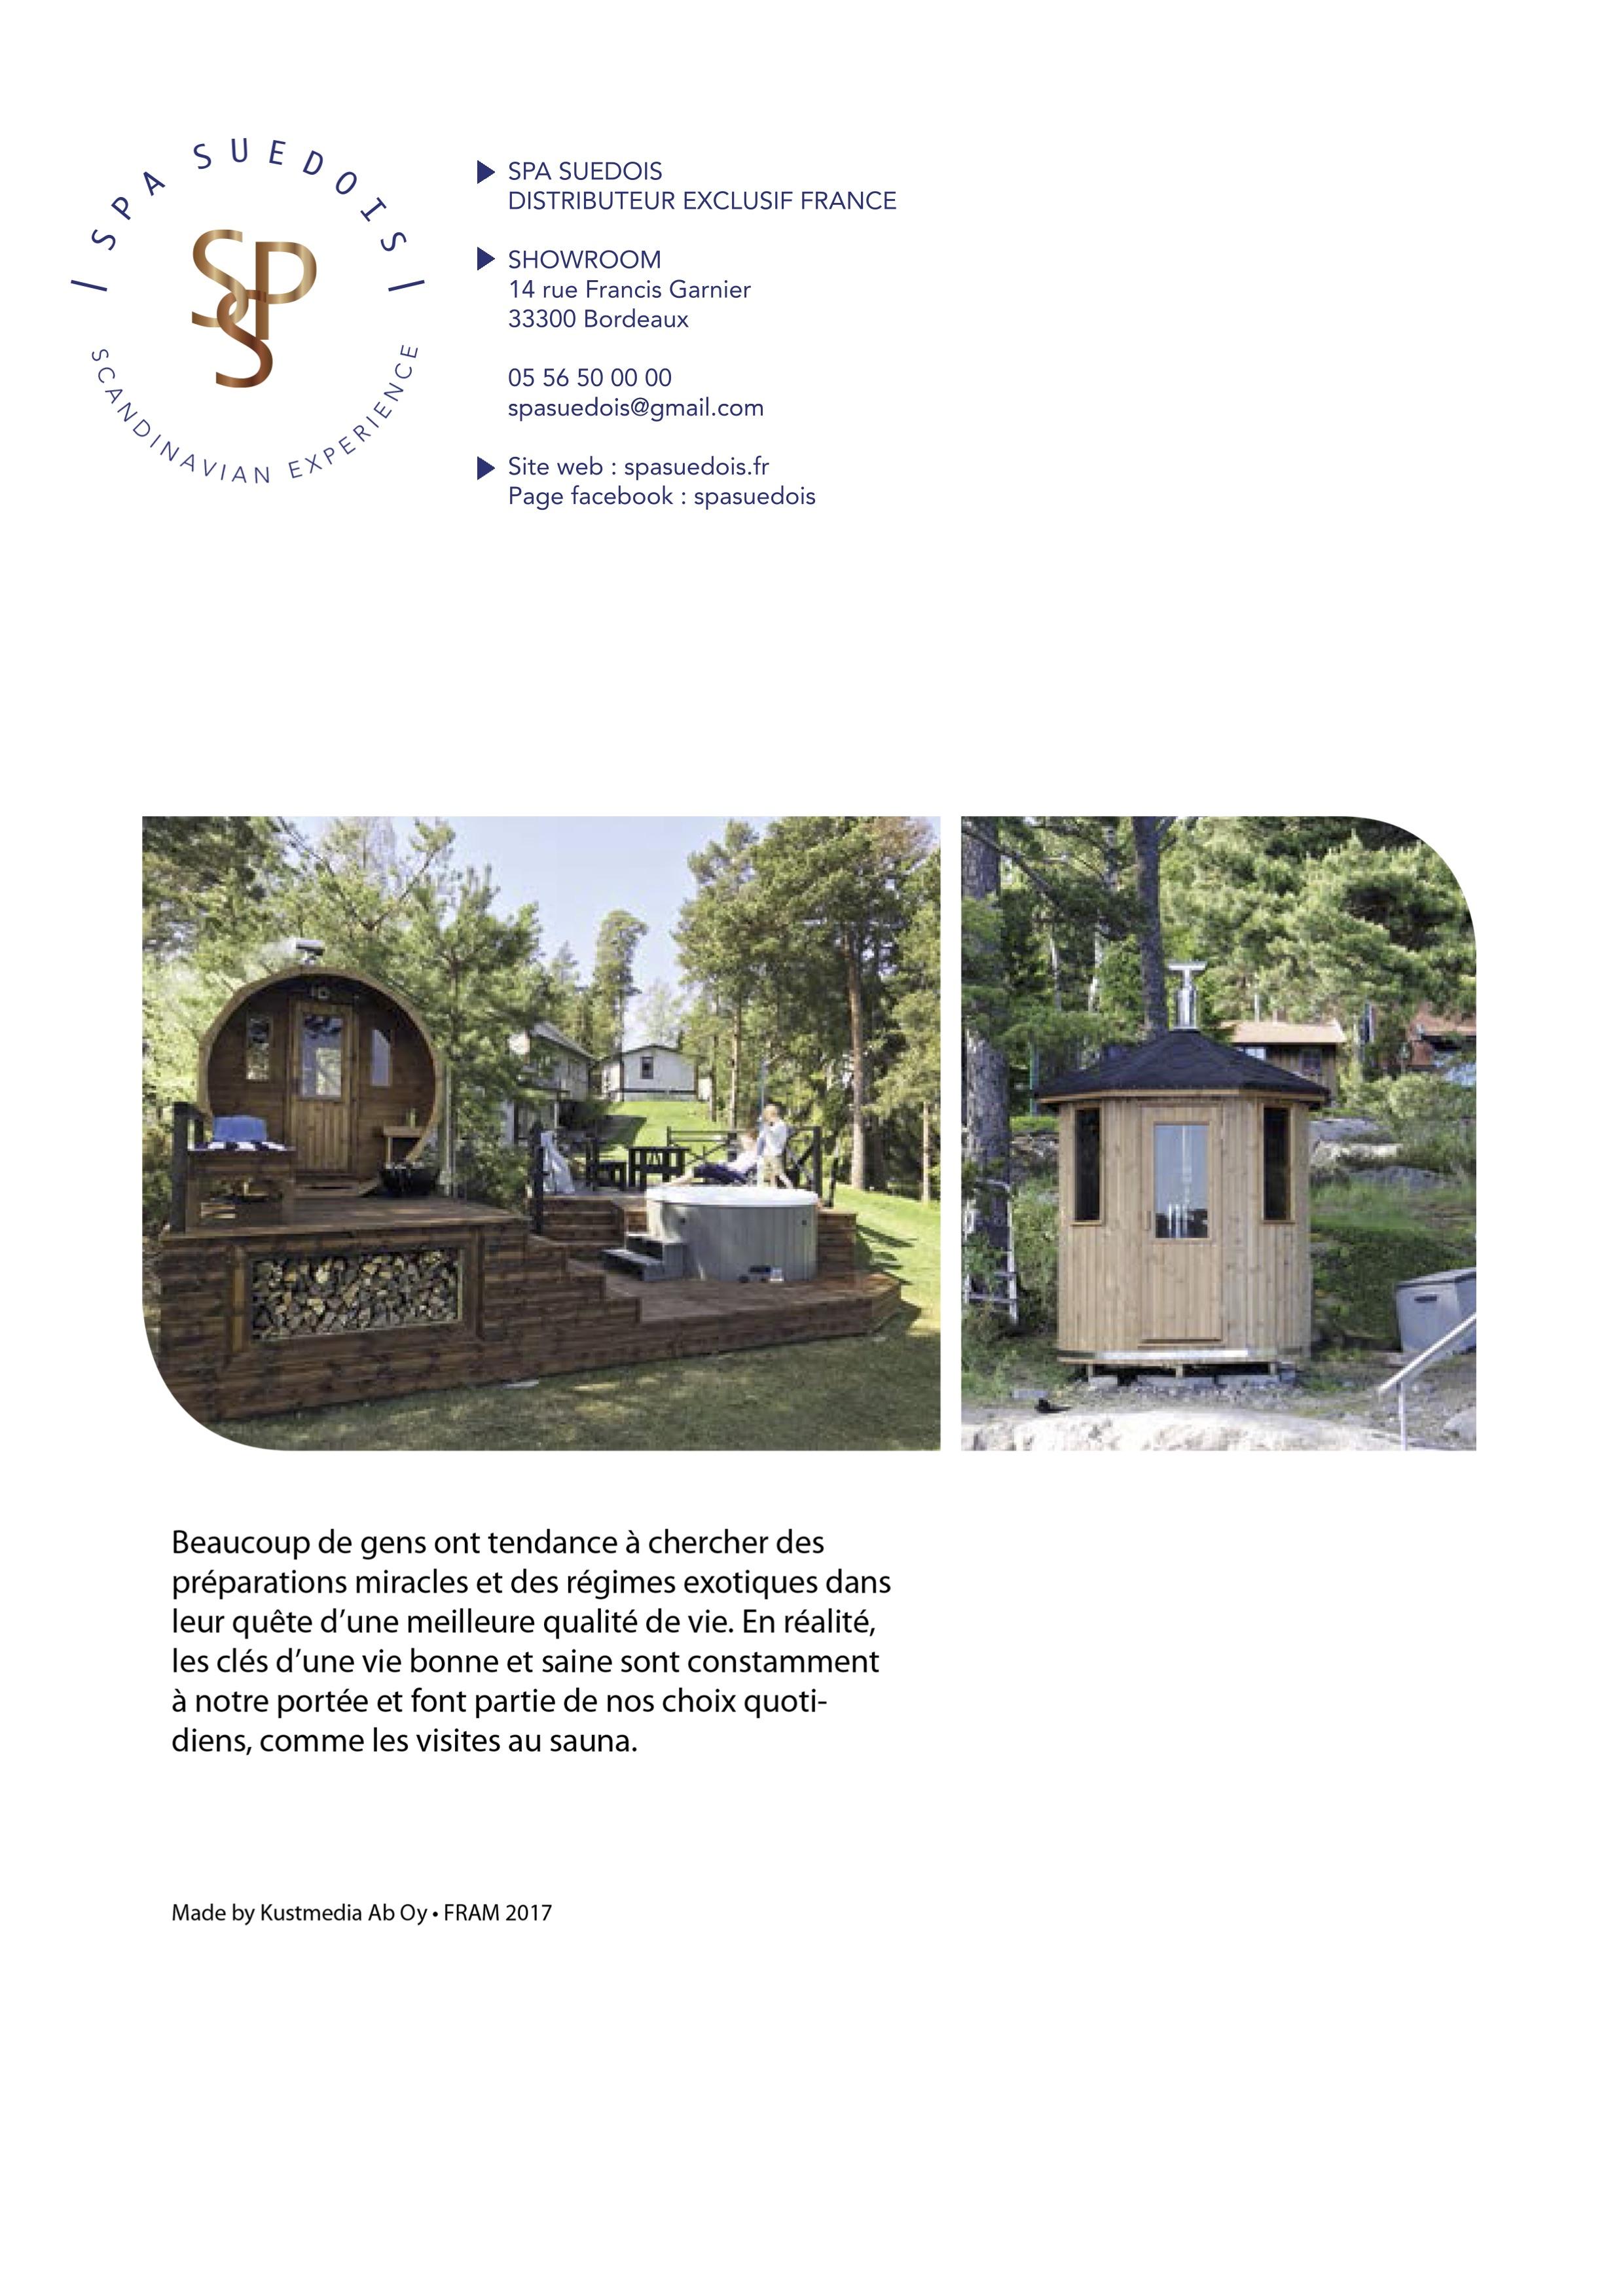 sauna finlandais une vraie experience scandinave. Black Bedroom Furniture Sets. Home Design Ideas